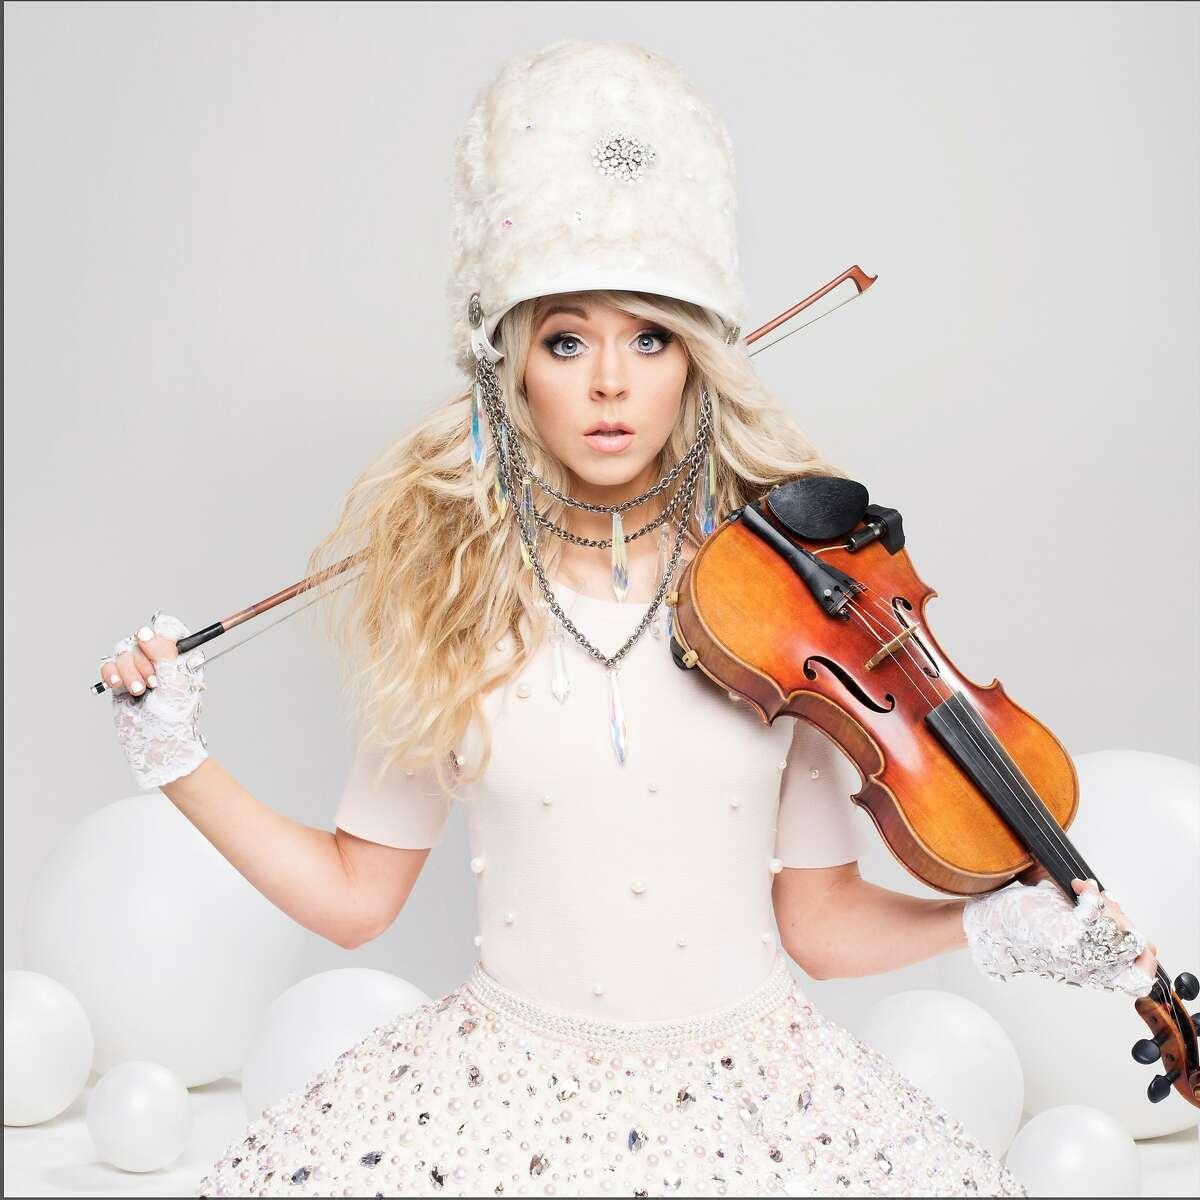 Violinist and YouTube star Lindsey Stirling